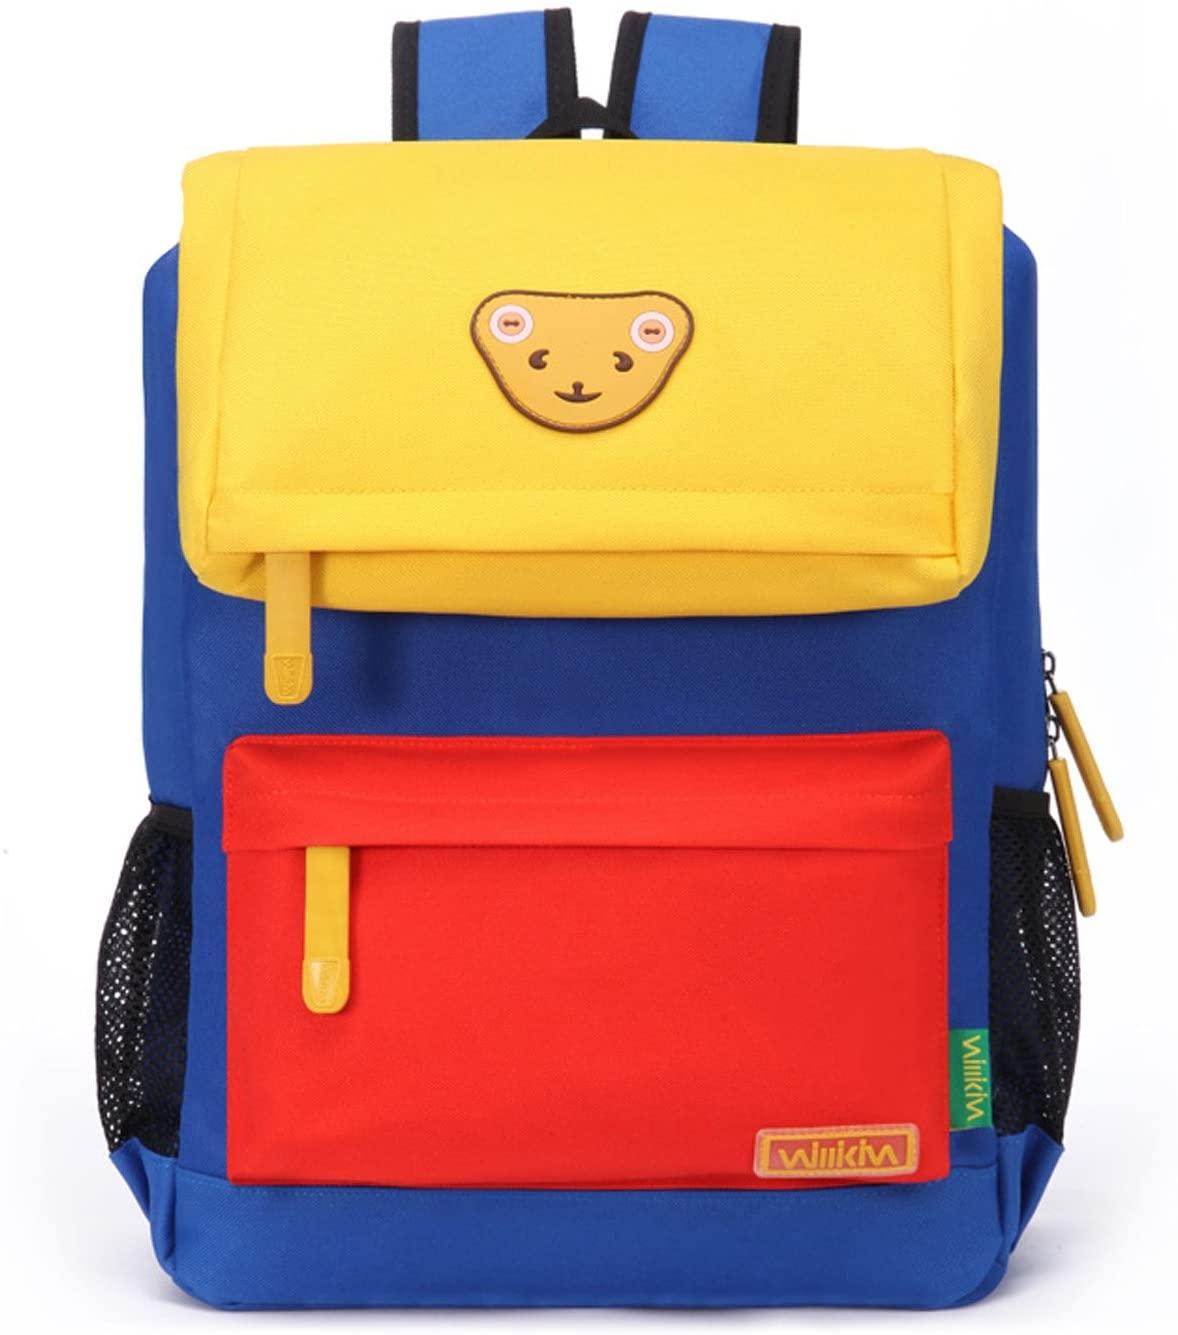 Willikiva Cute Bear Kids School Backpack for Children Elementary School Bags Girls Boys Bookbags (Yellow/Orange/Azure, Medium)